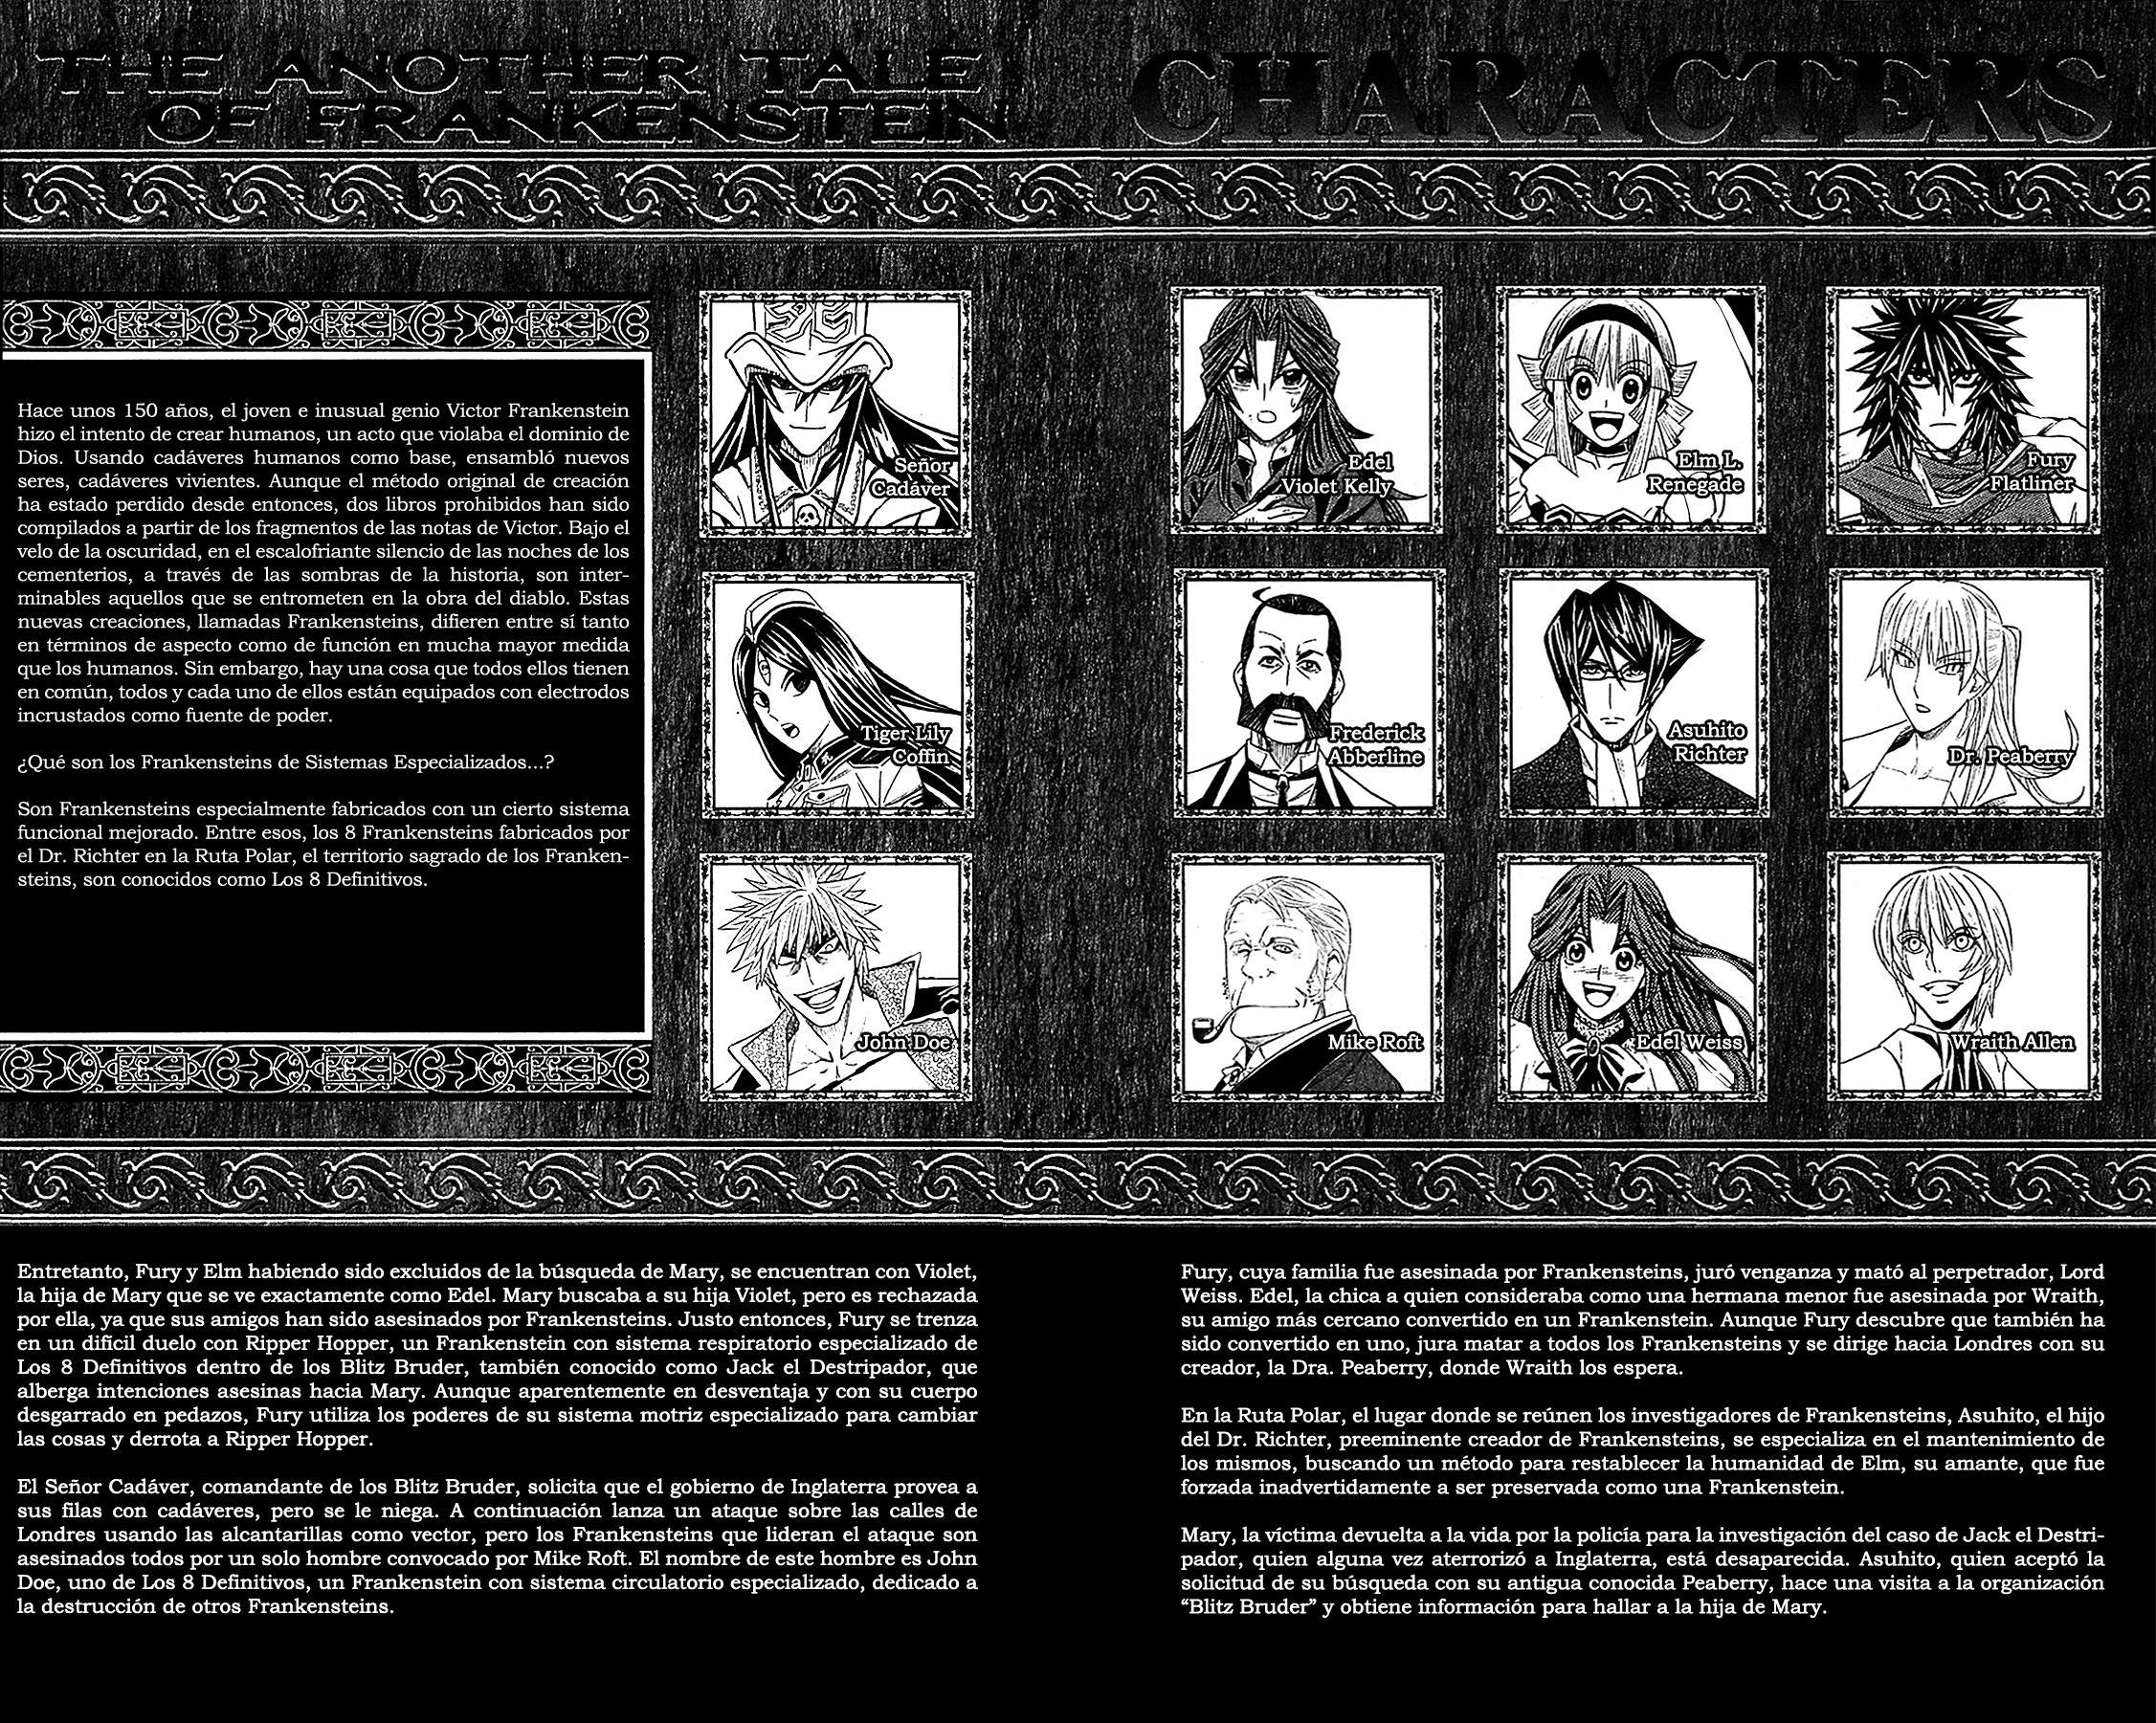 http://c5.ninemanga.com/es_manga/45/18797/447914/2d66aed7a5328a988f77cbaec59fc047.jpg Page 8